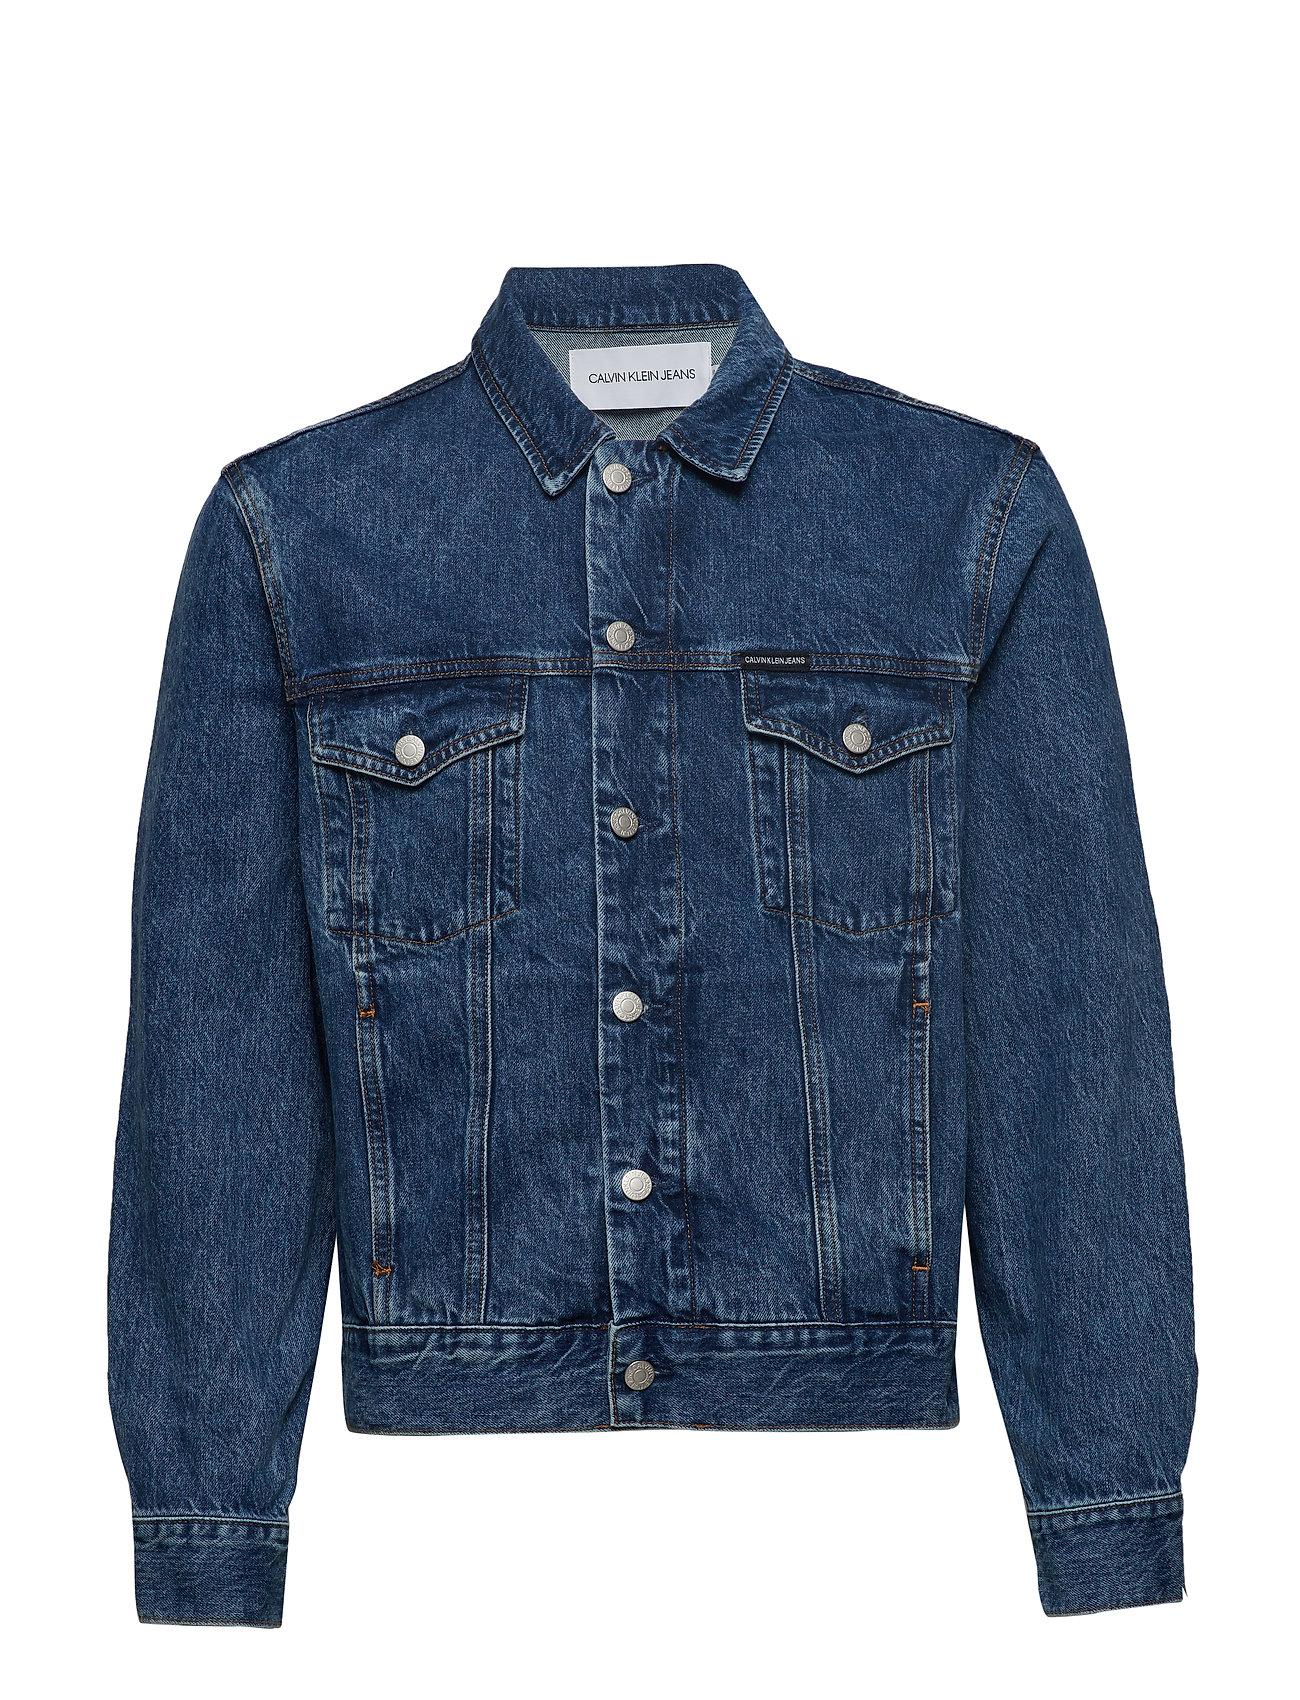 Calvin Klein Jeans MODERN CLASSIC TRUCKER - MID STONE- EMBROIDERED MOUNTAI